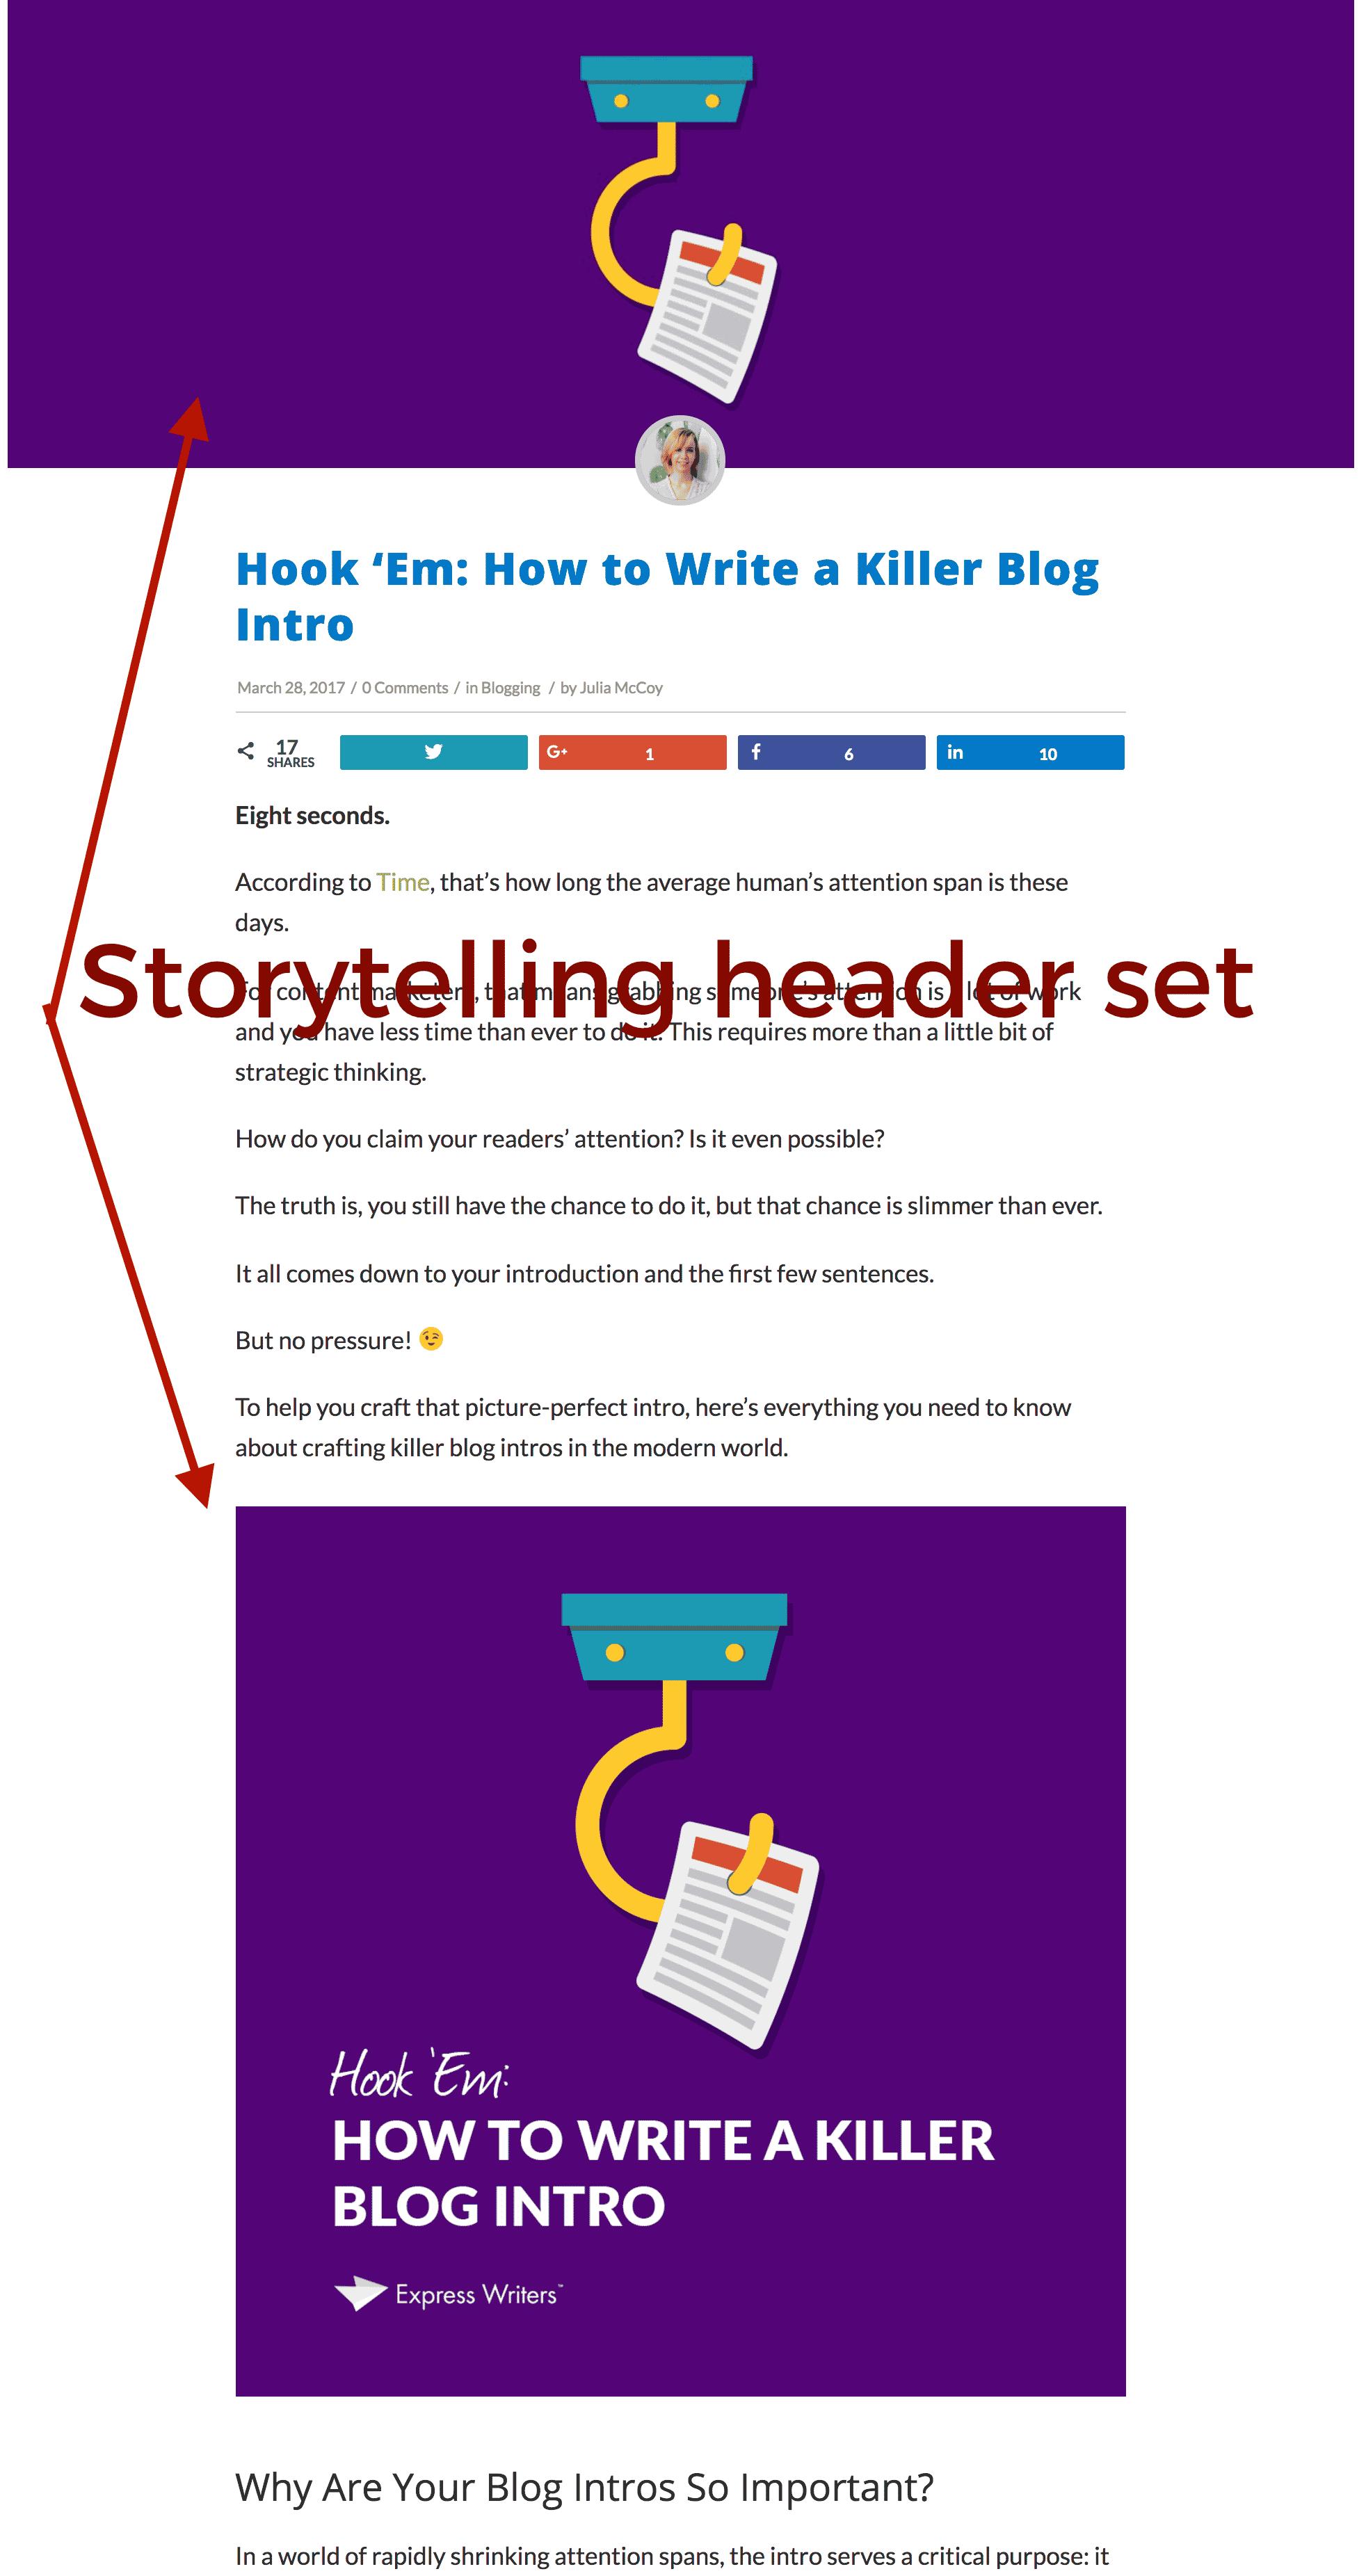 Promotional archives express writers storytelling header set fandeluxe Images